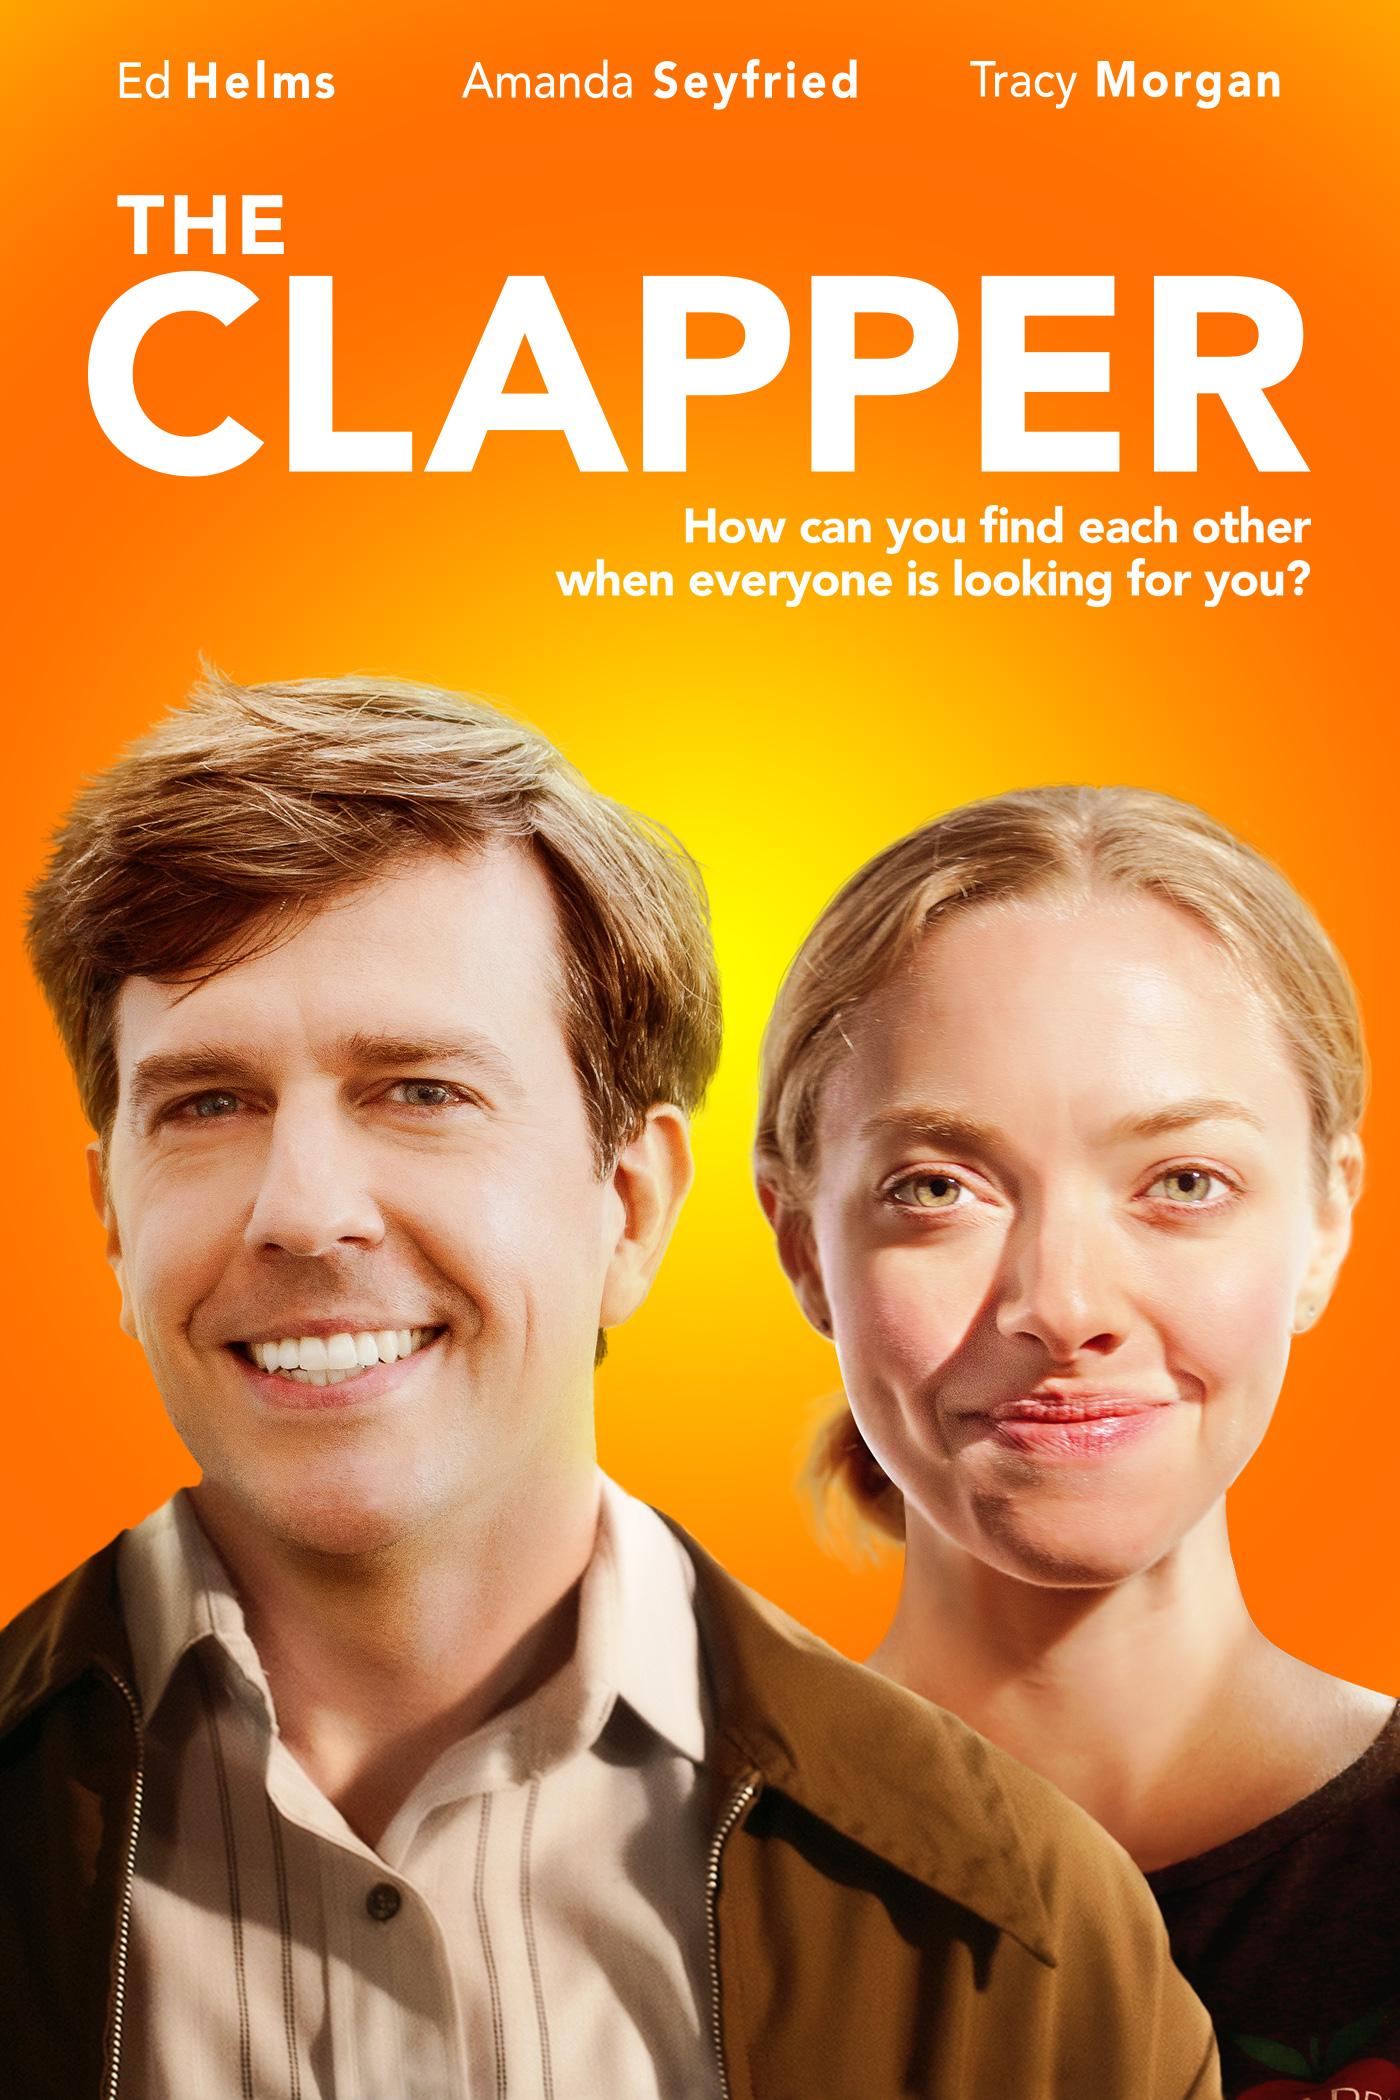 CLAPPER_1400x2100.jpg